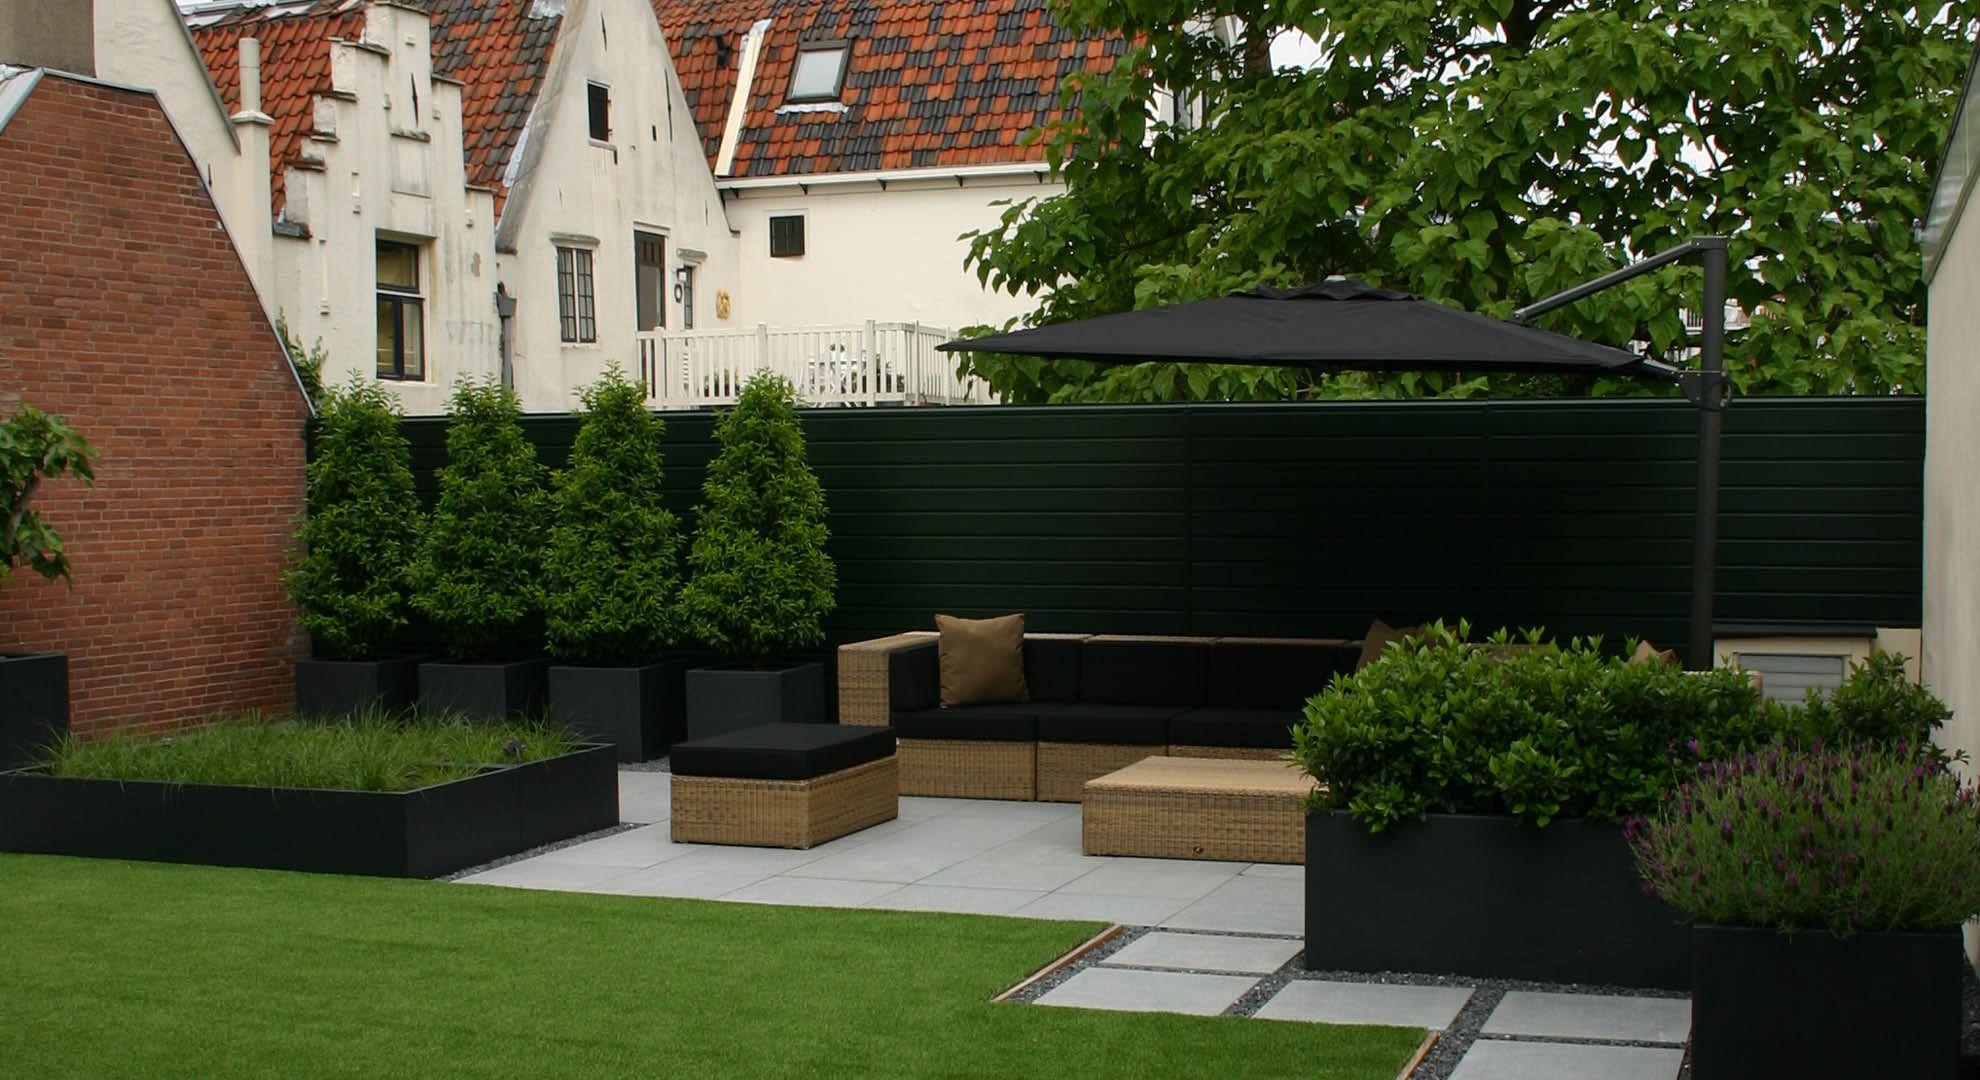 Rodenburg tuinen modern dakterras in utrecht met kunstgras en